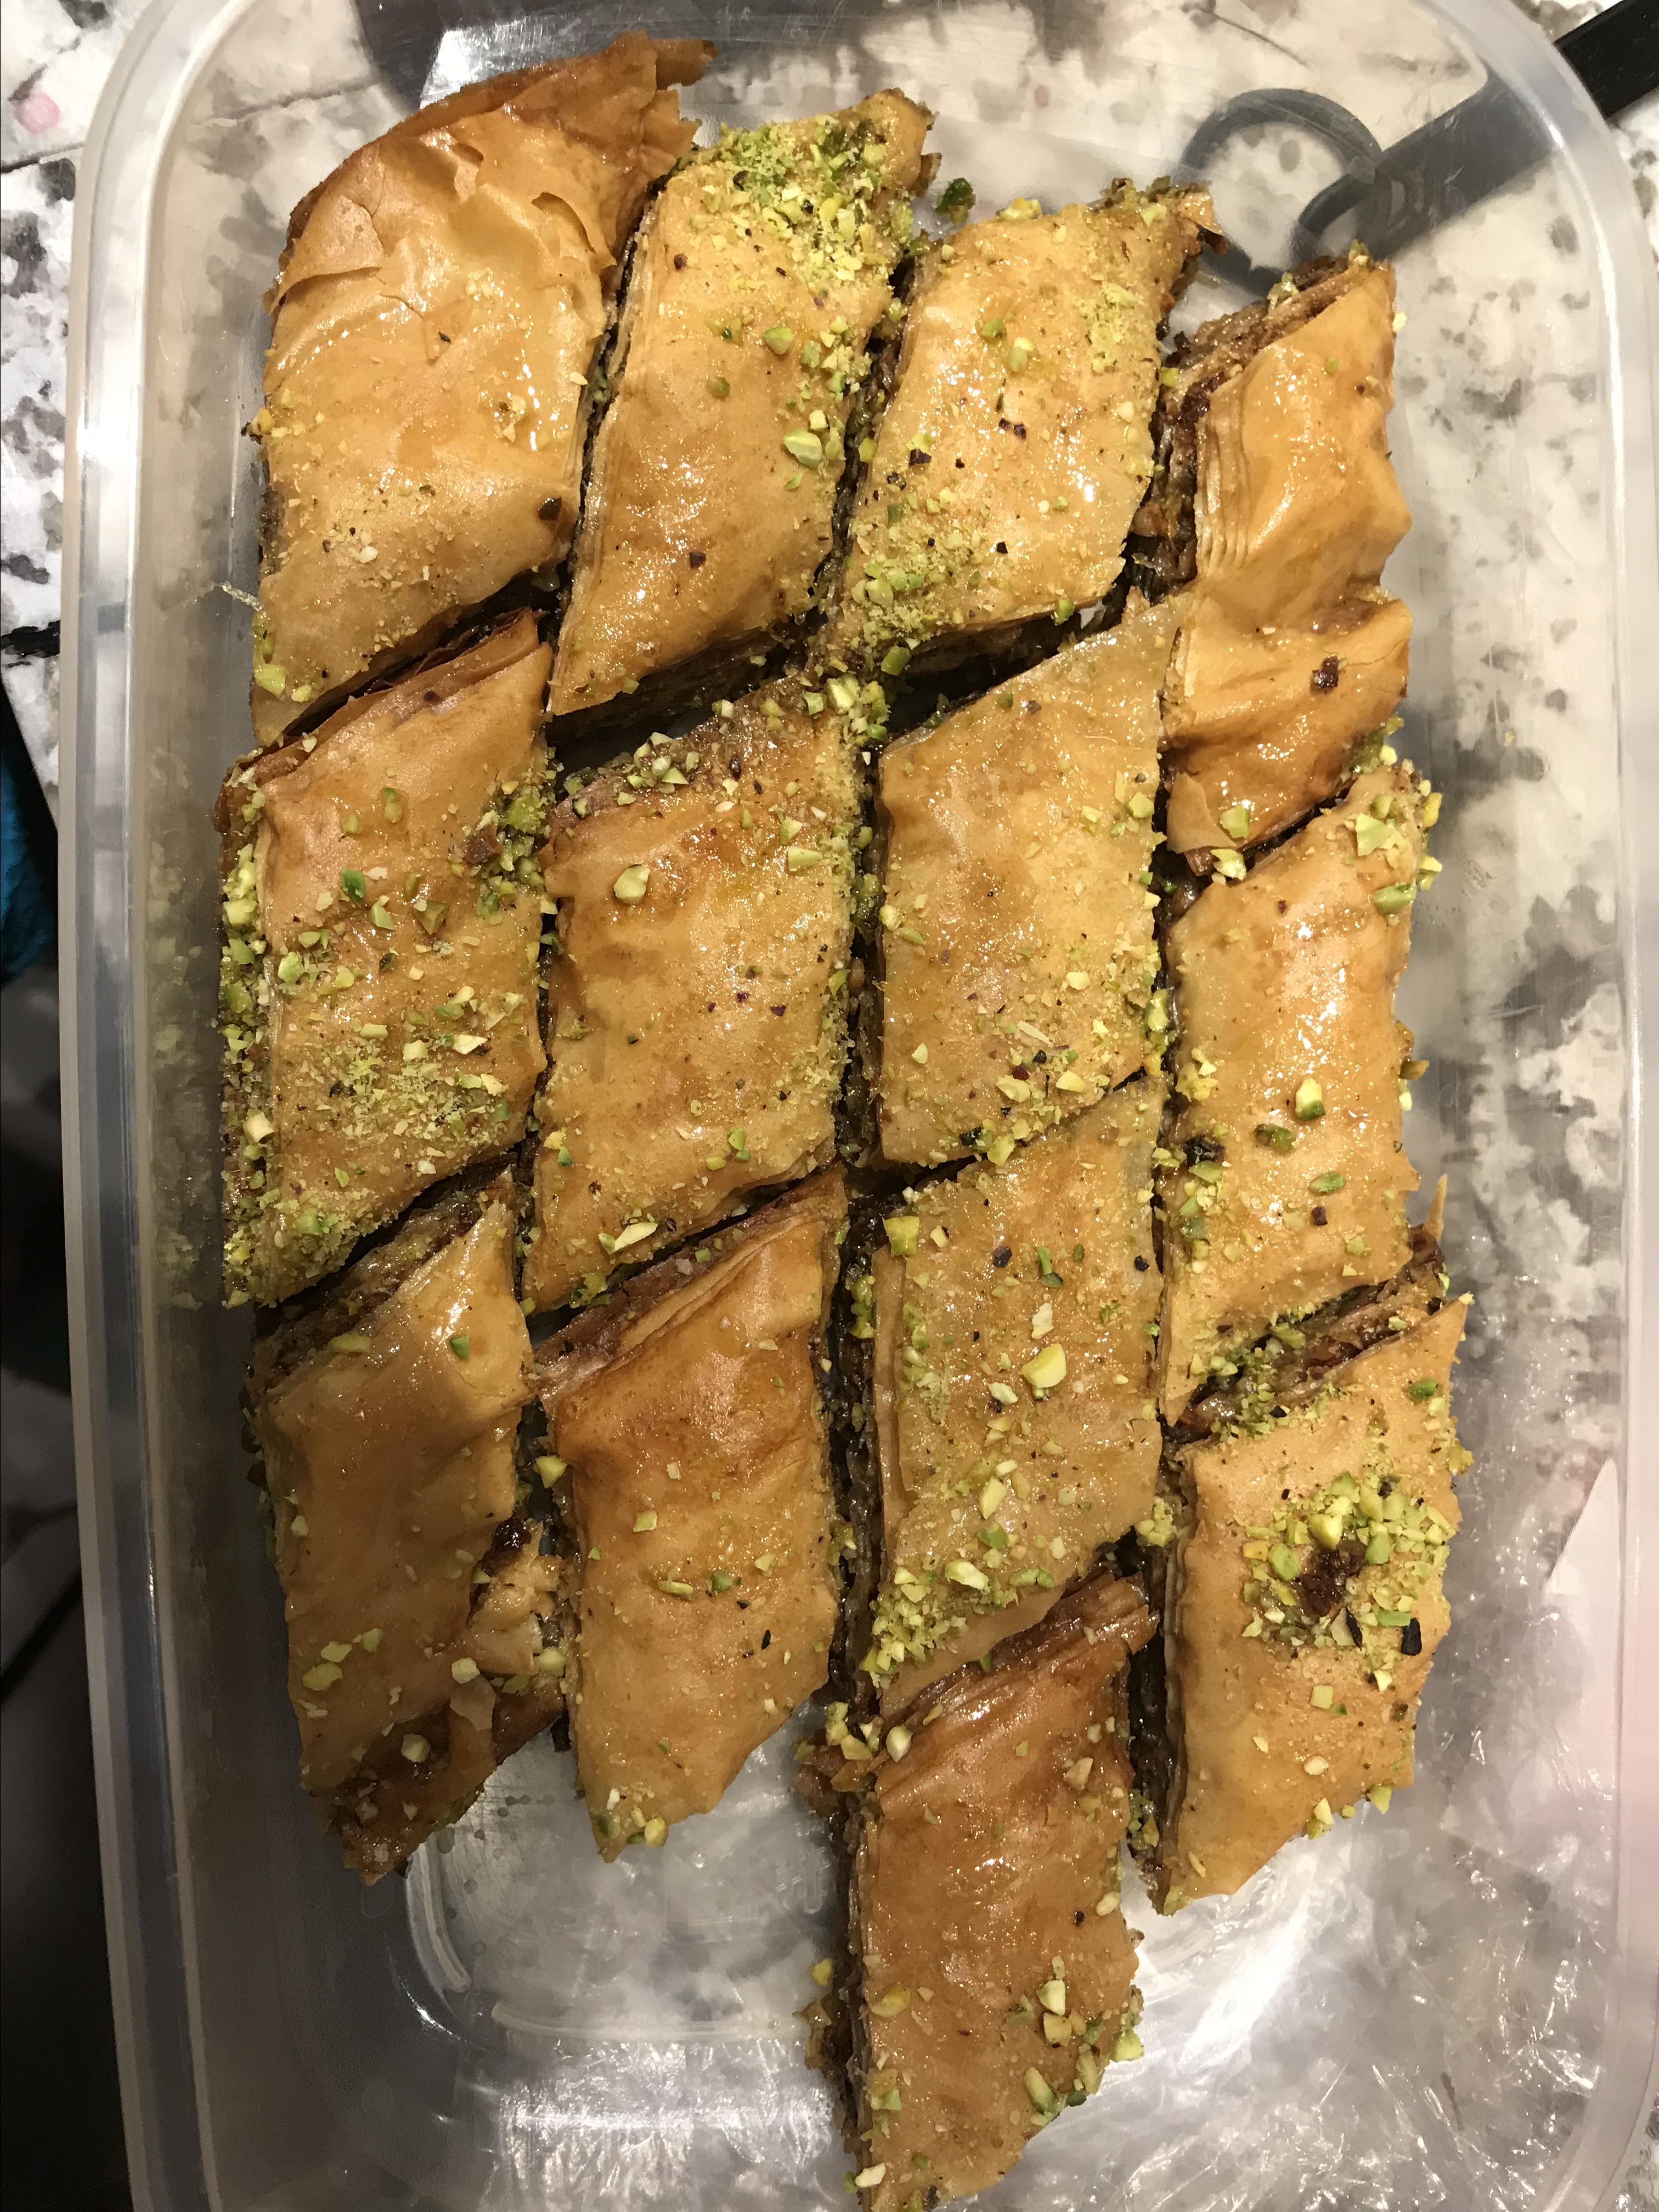 Easy Baklava Dalida El-Samra